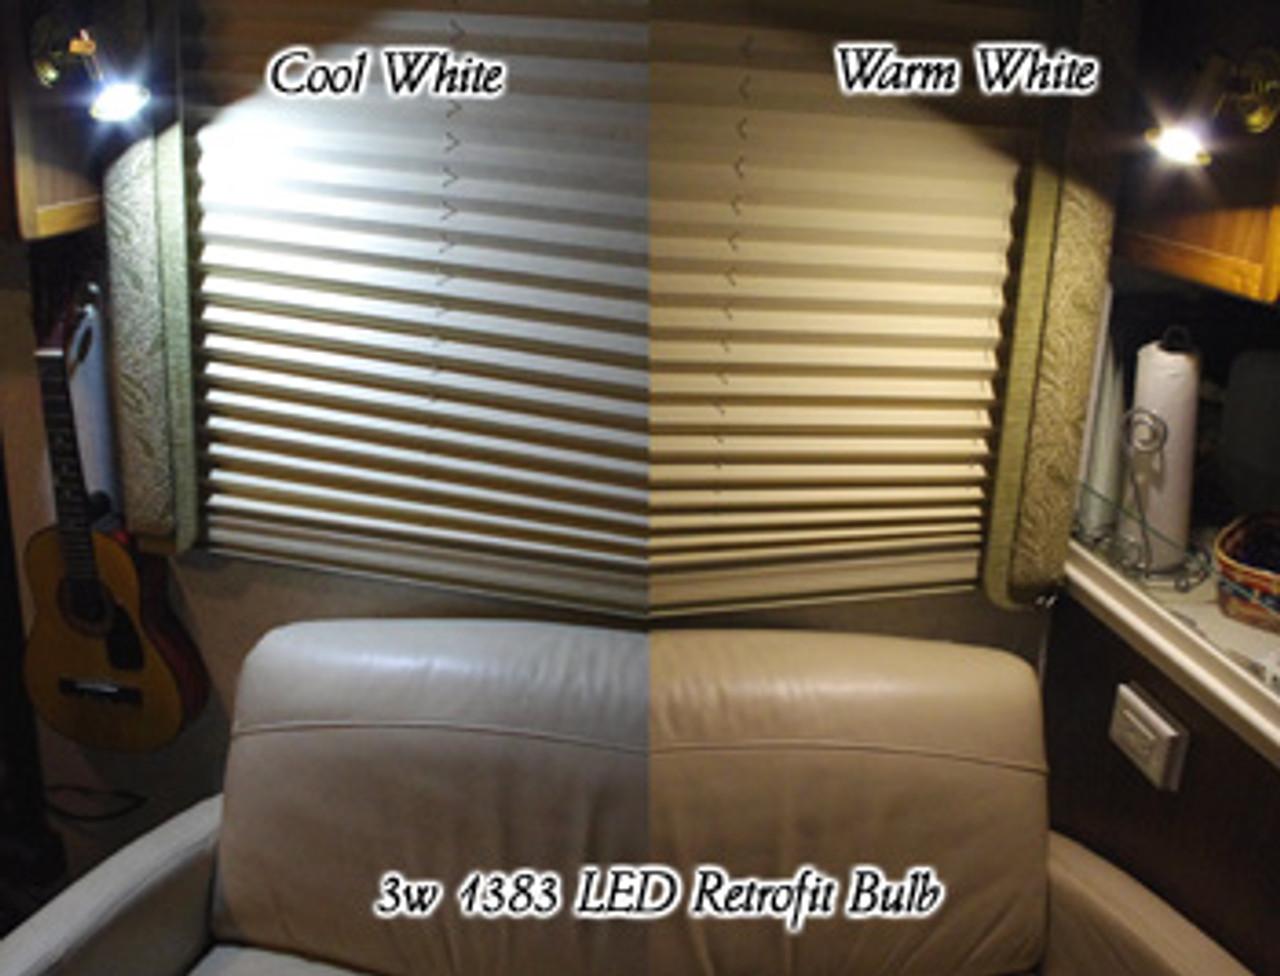 1383-3W-WW Warm White 1383 Retrofit Bulb 3 Watts Aluminum Finned Housing